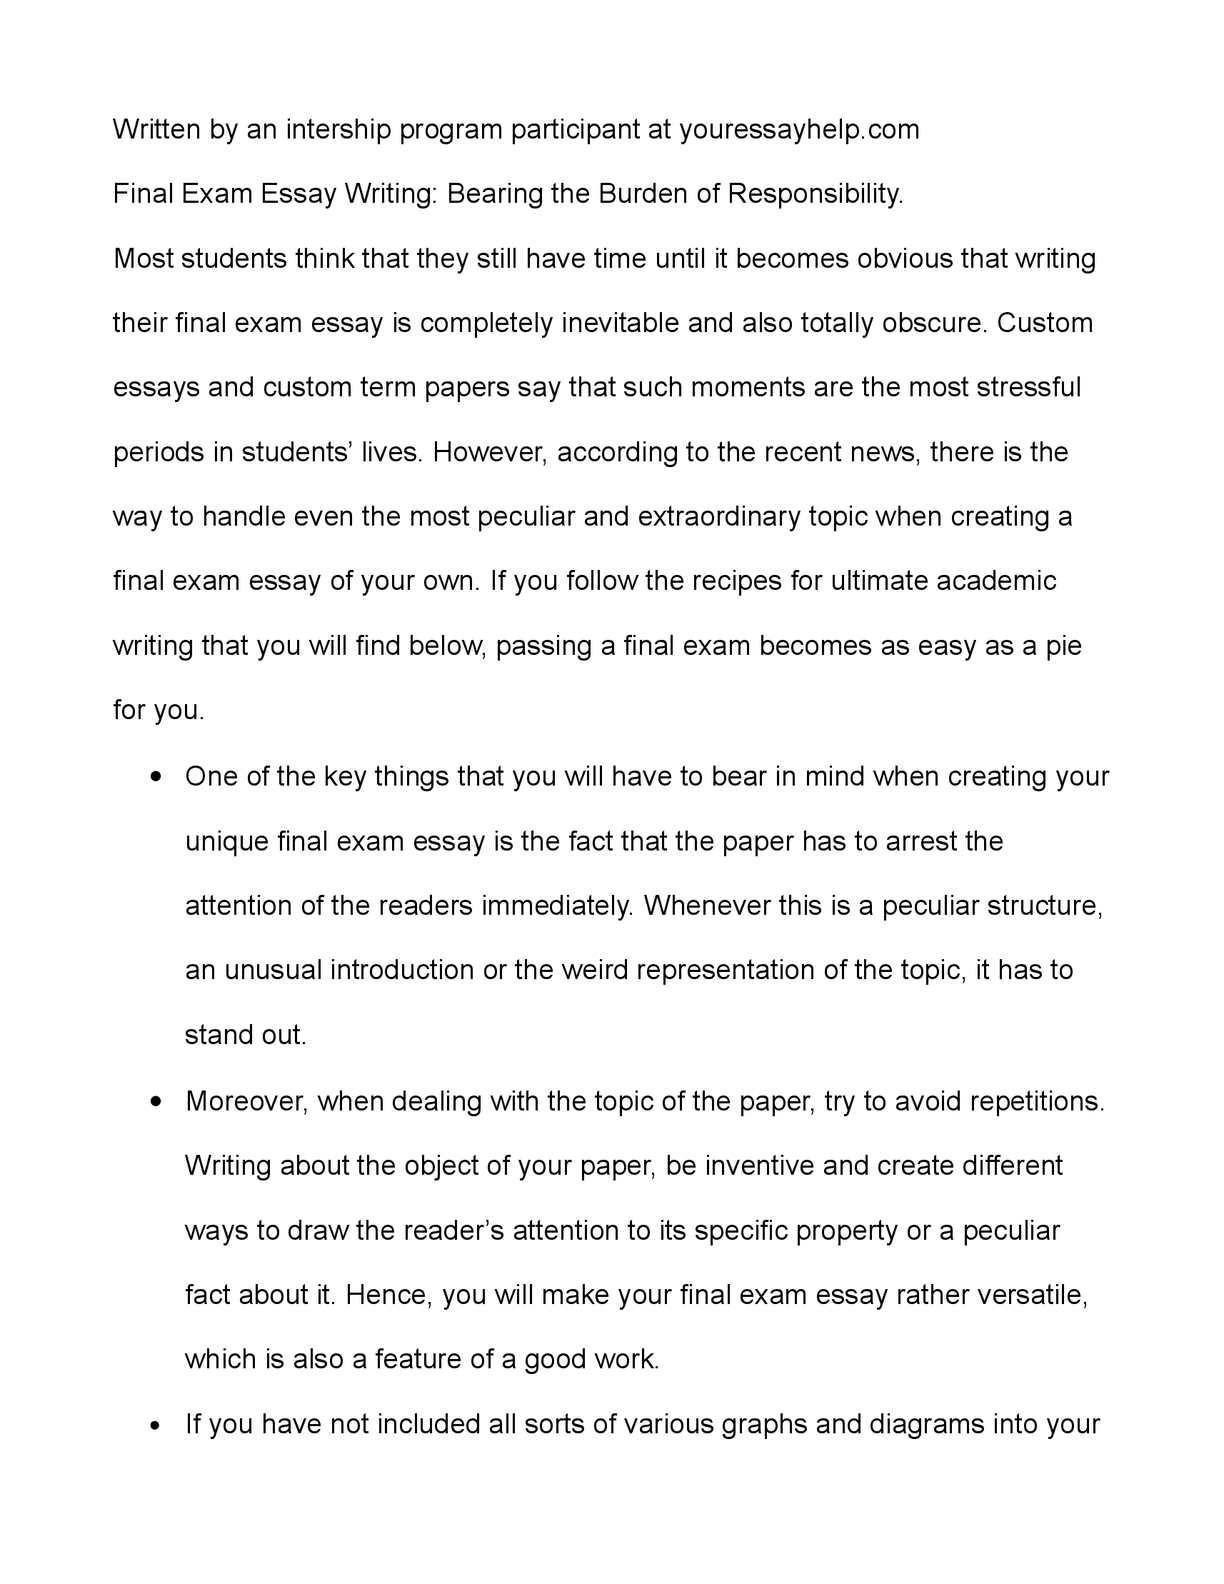 human responsibility essay